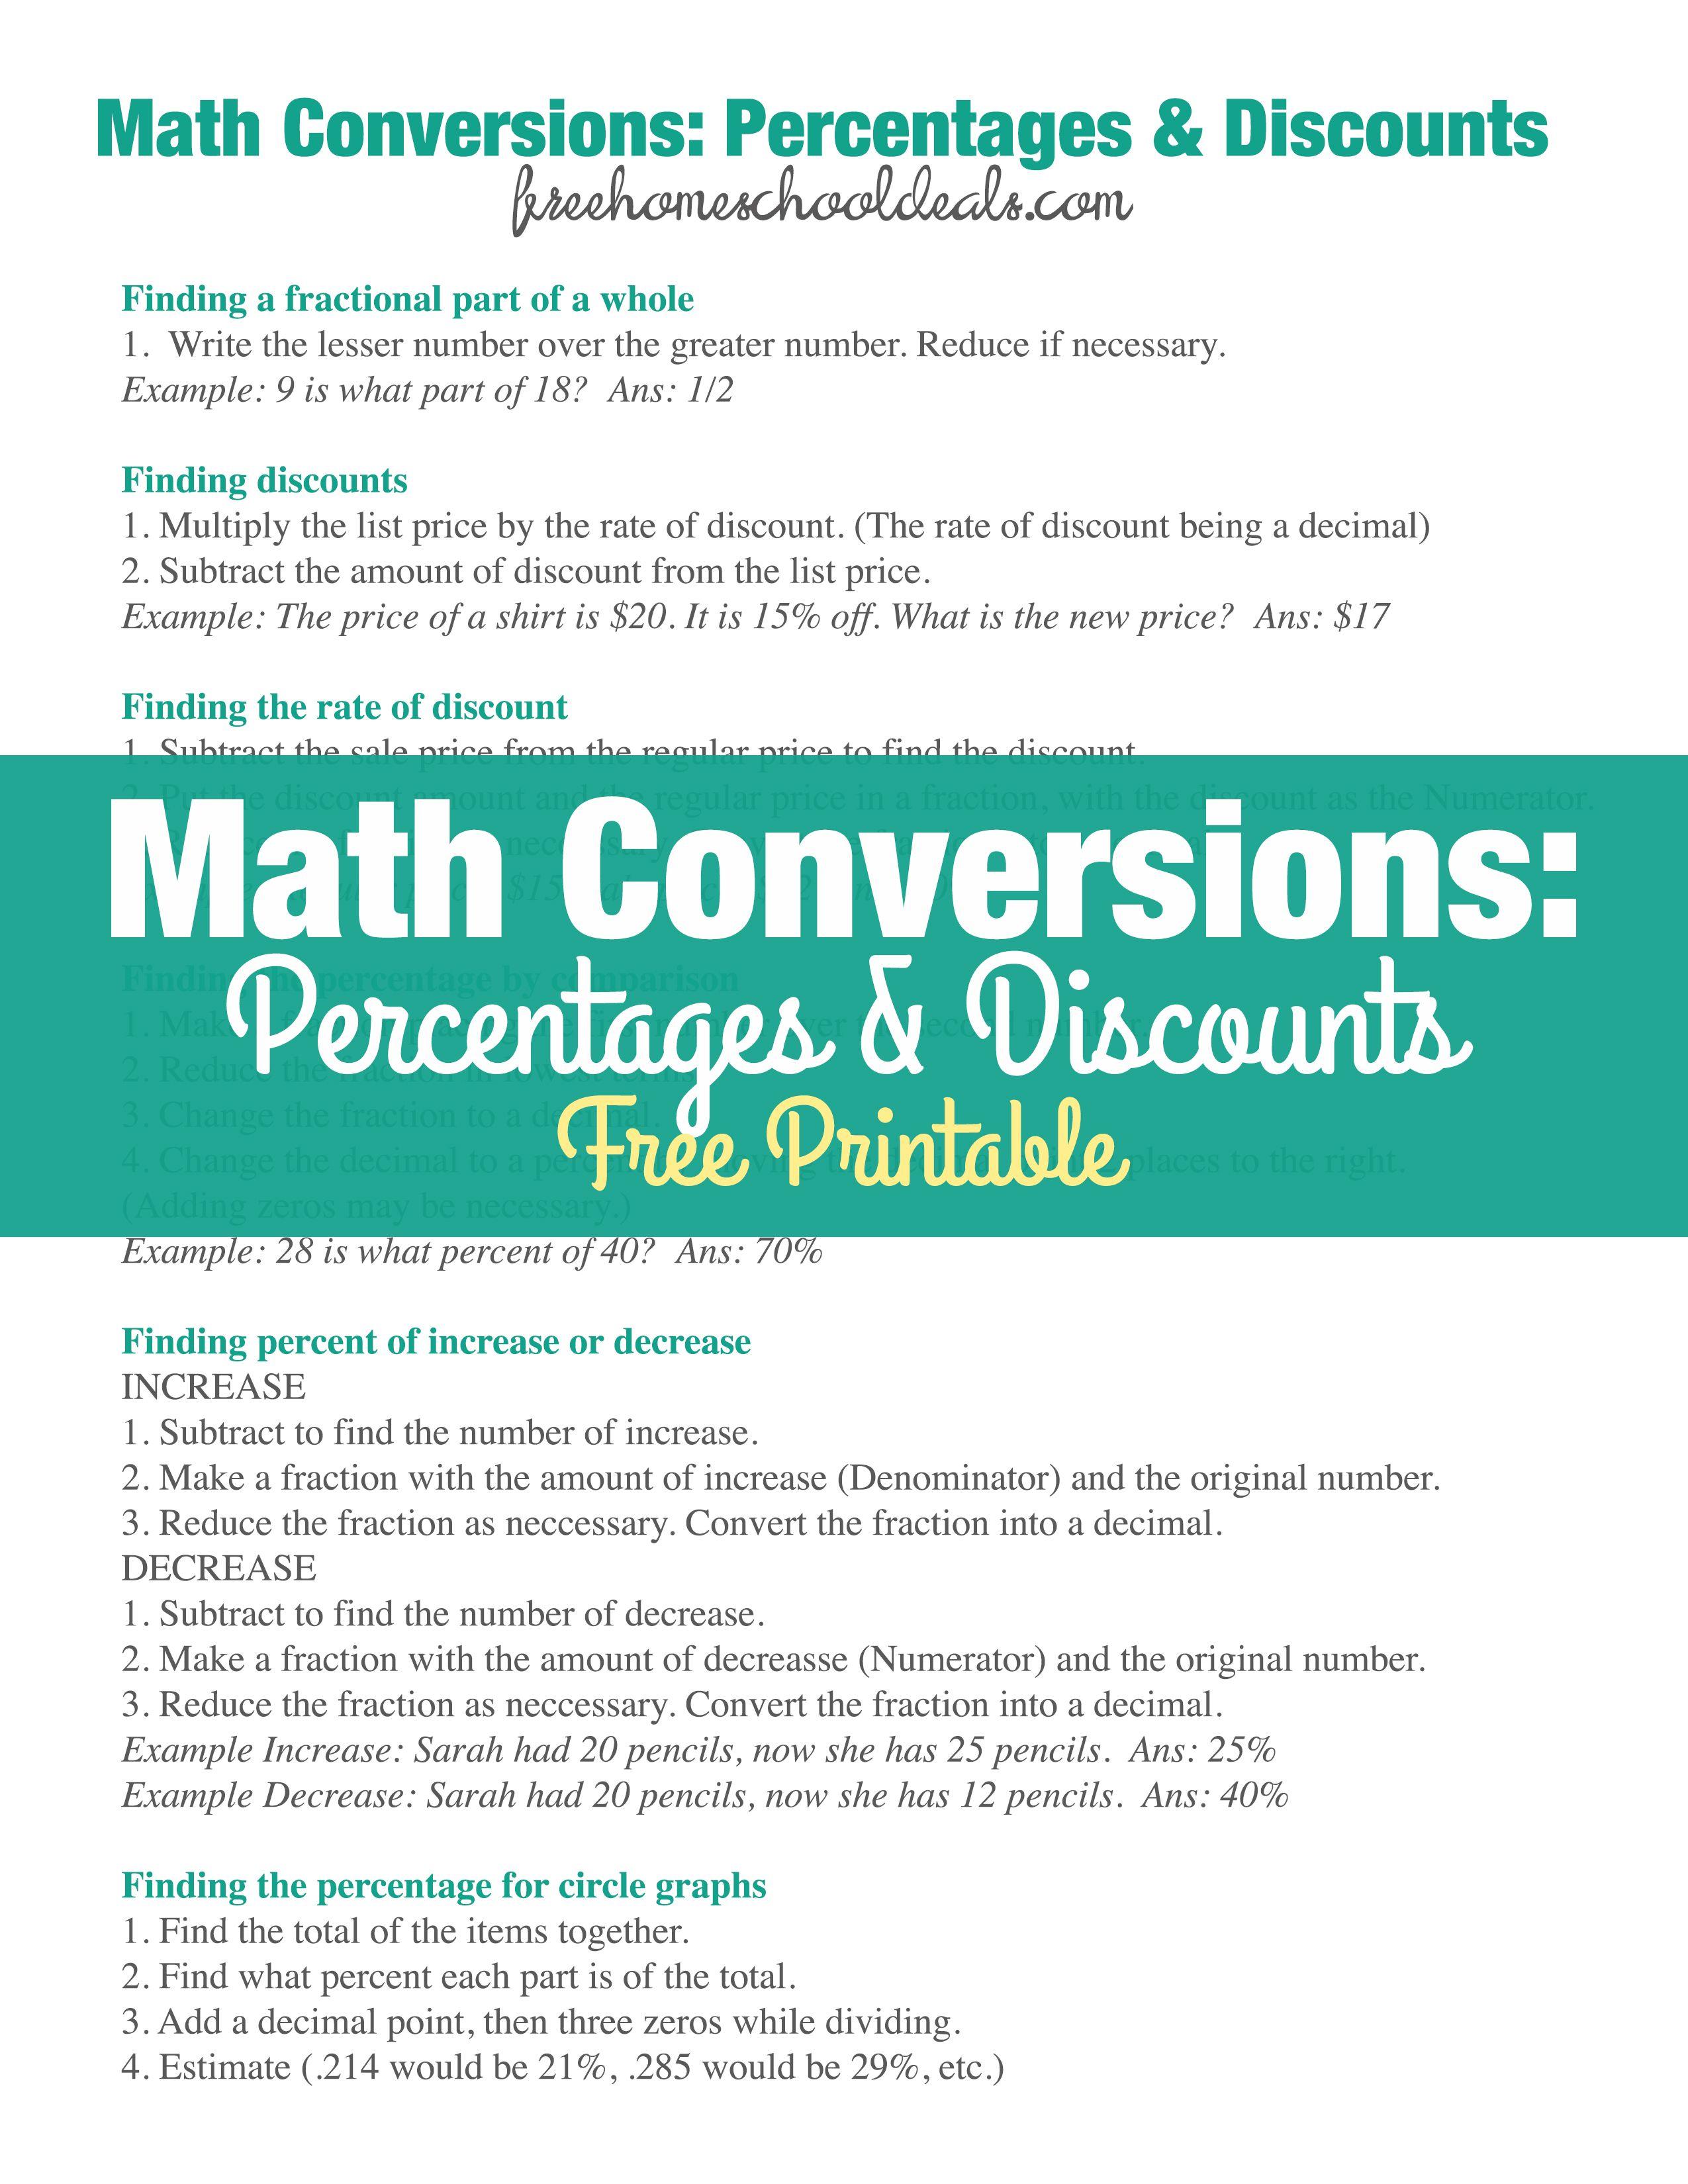 Free Math Conversions Percent Amp Discounts Printable Cheat